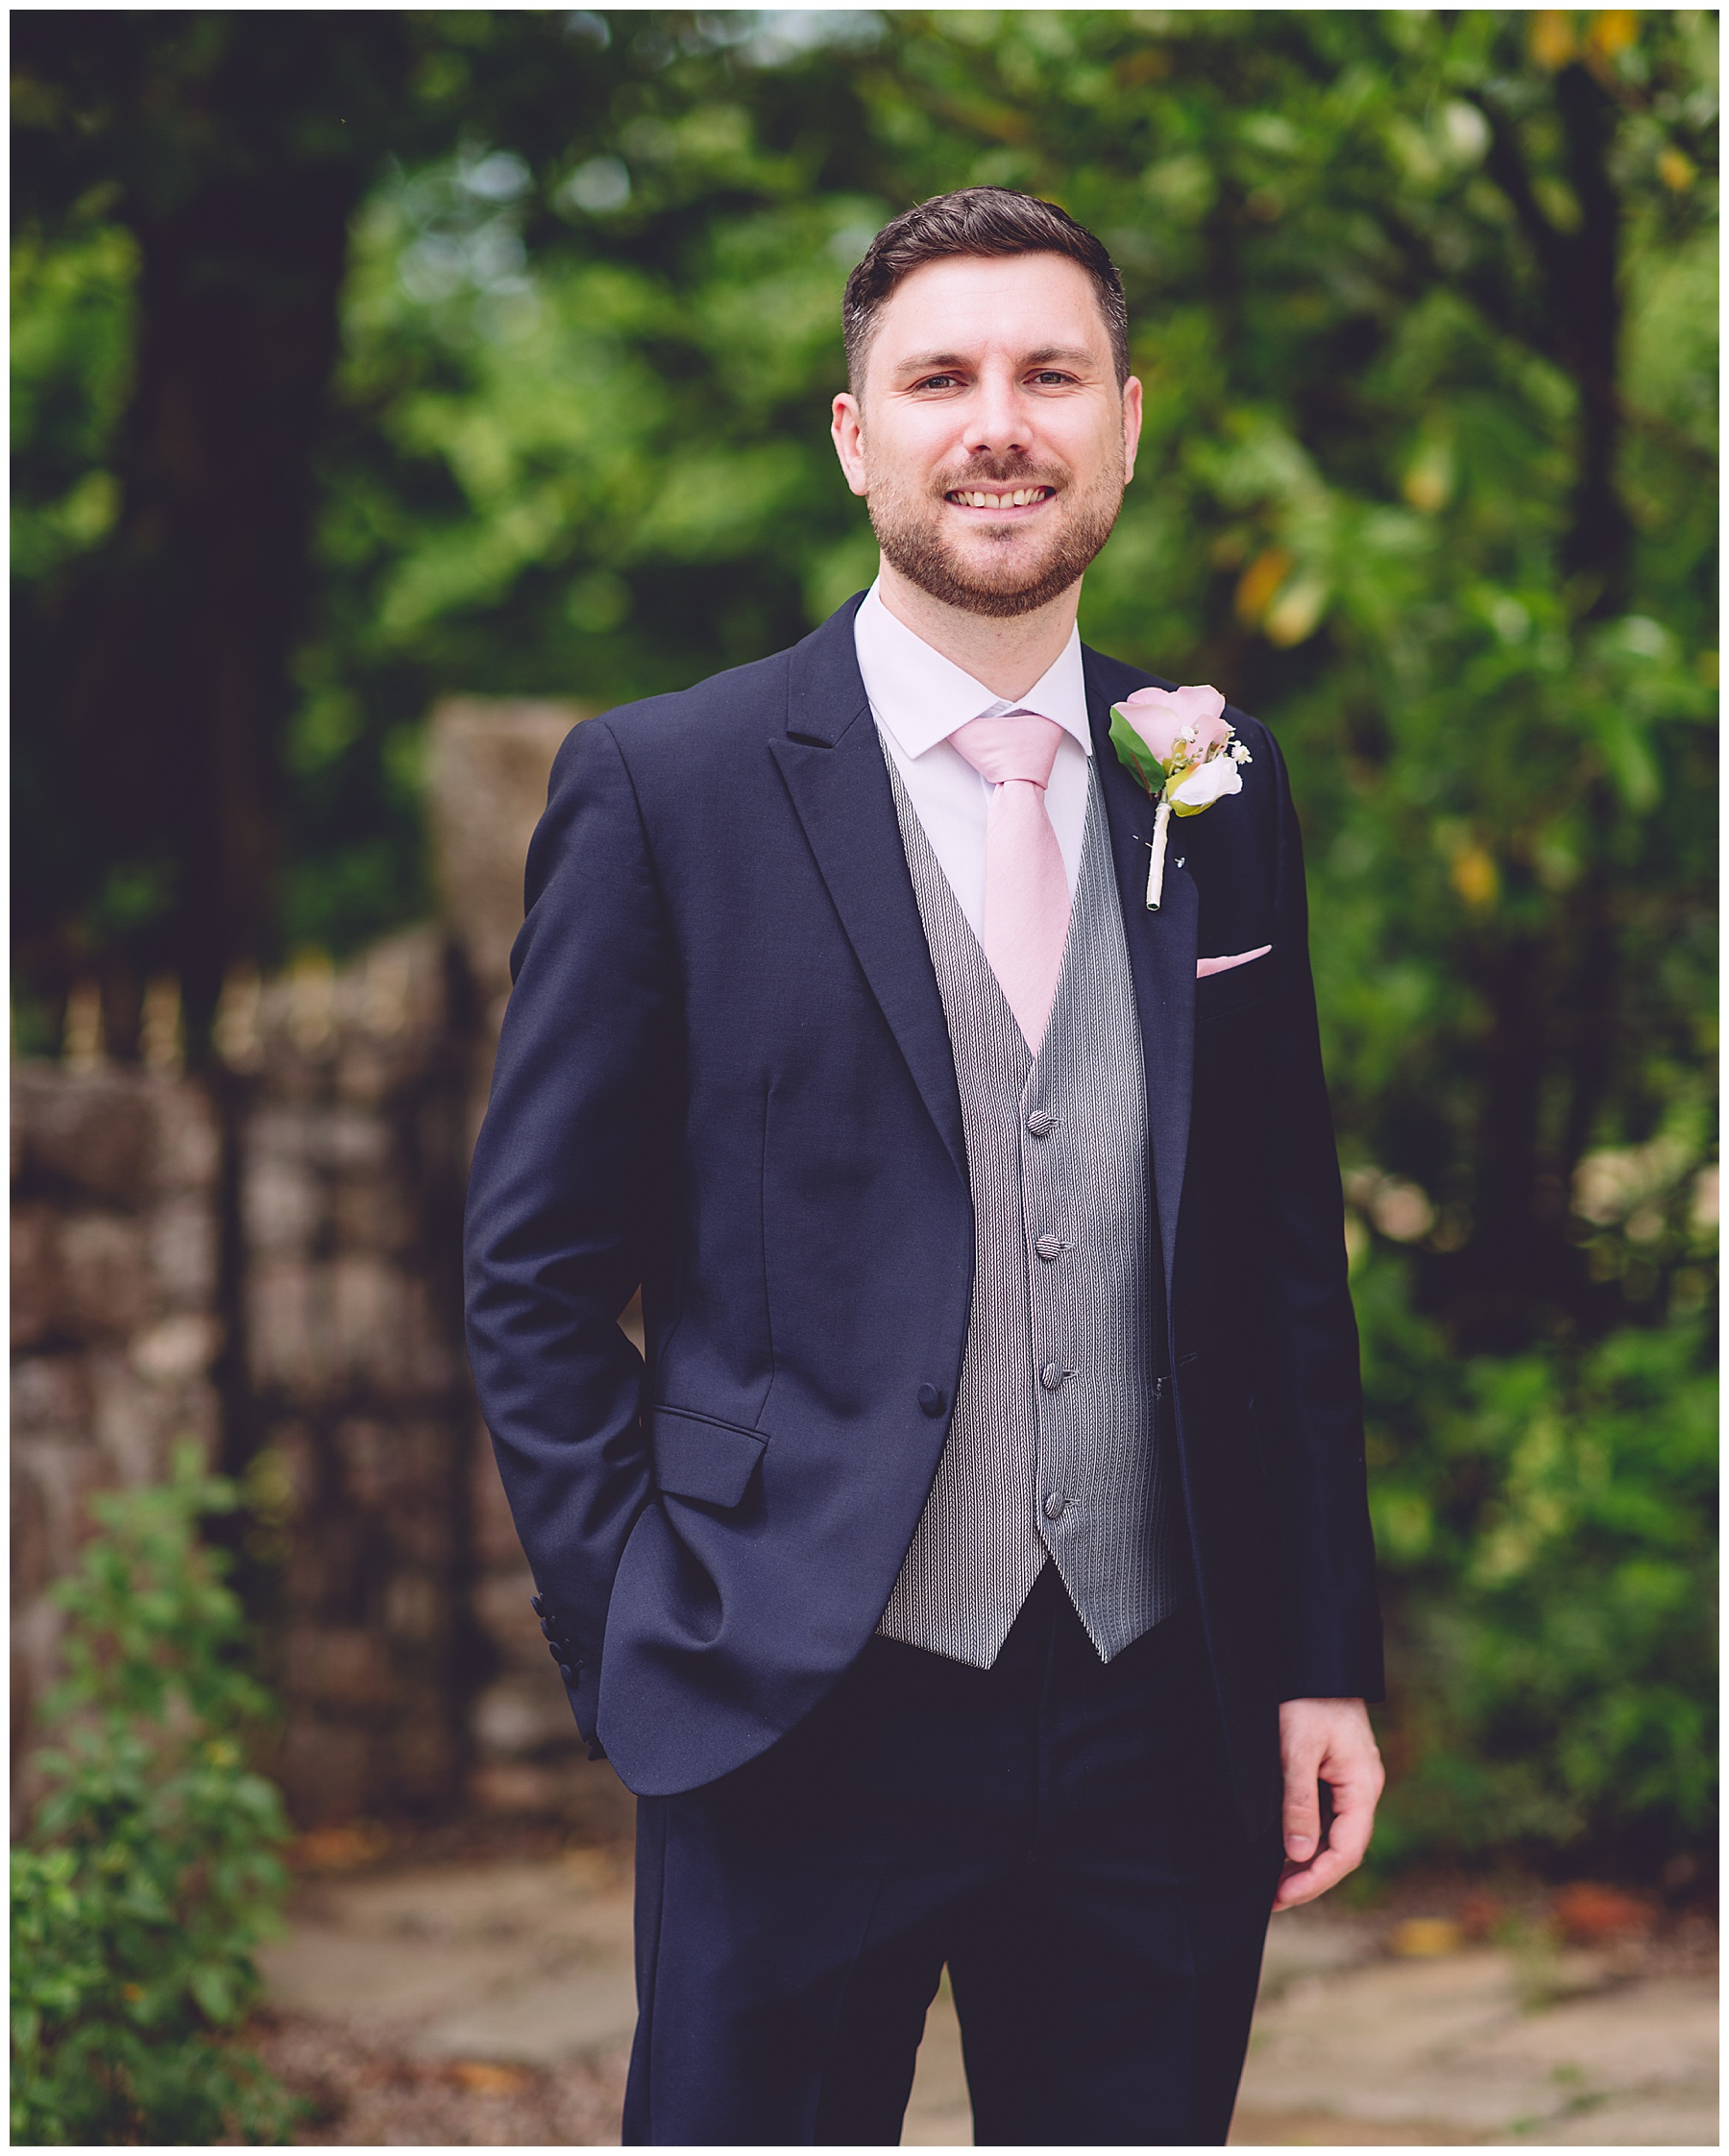 Groom at King Arthur Wedding